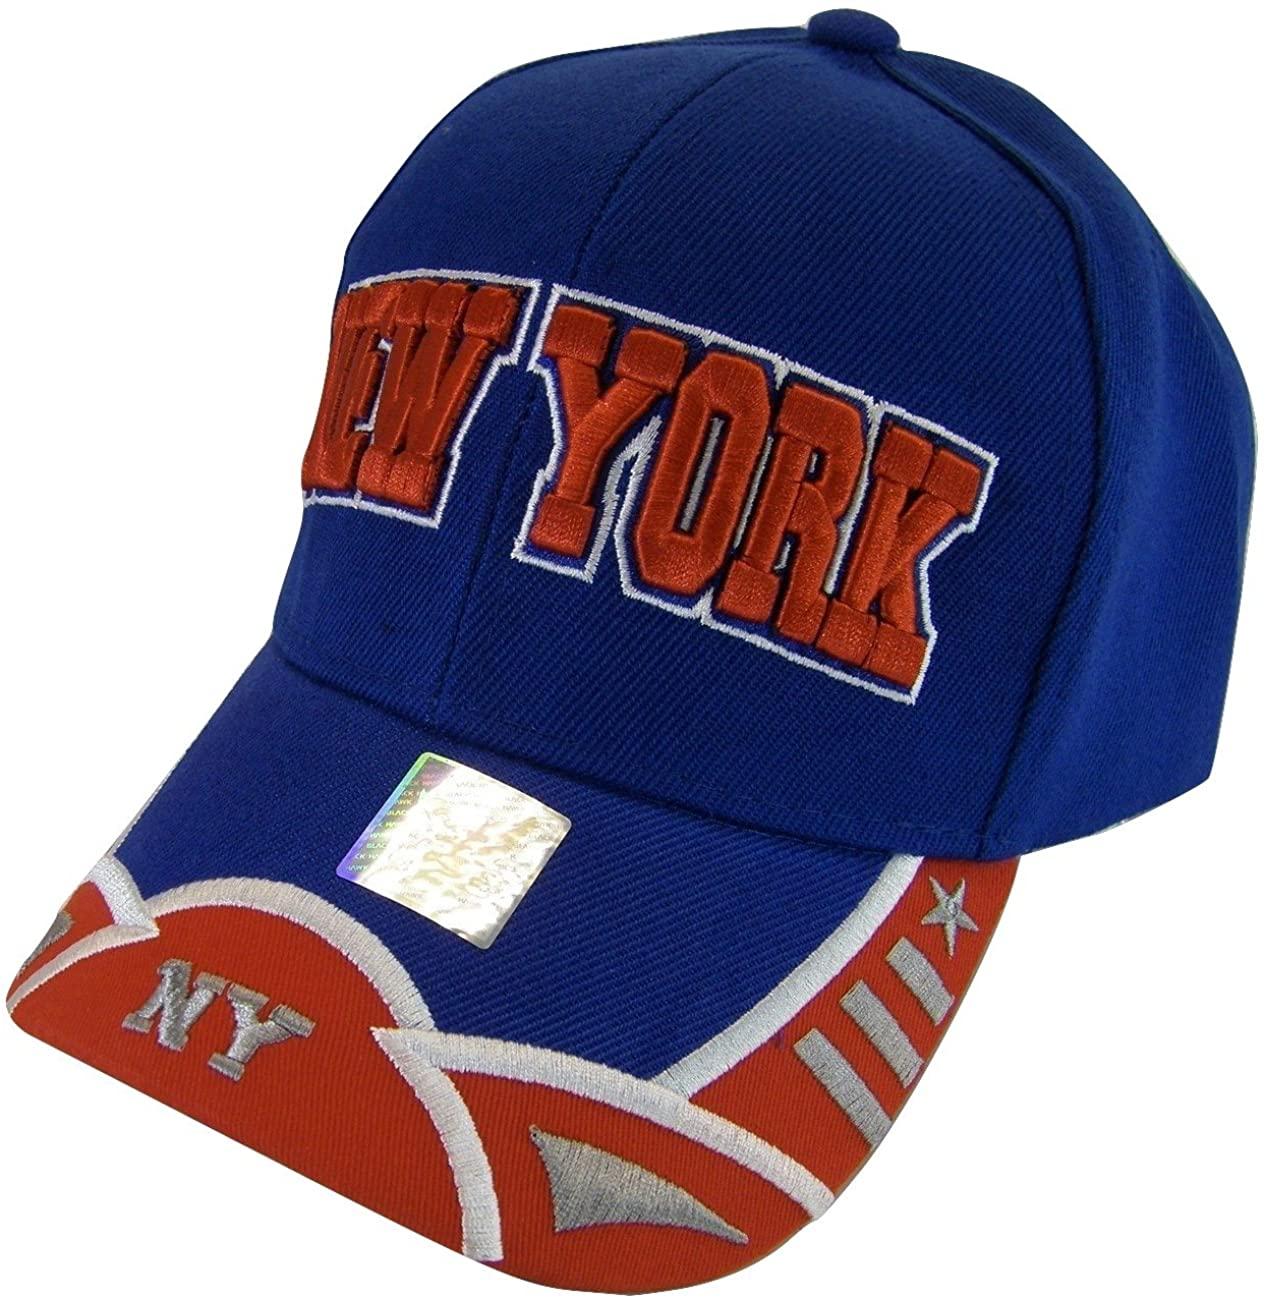 New York City Men's Small Star & Dashes 2-Tone Adjustable Baseball Cap